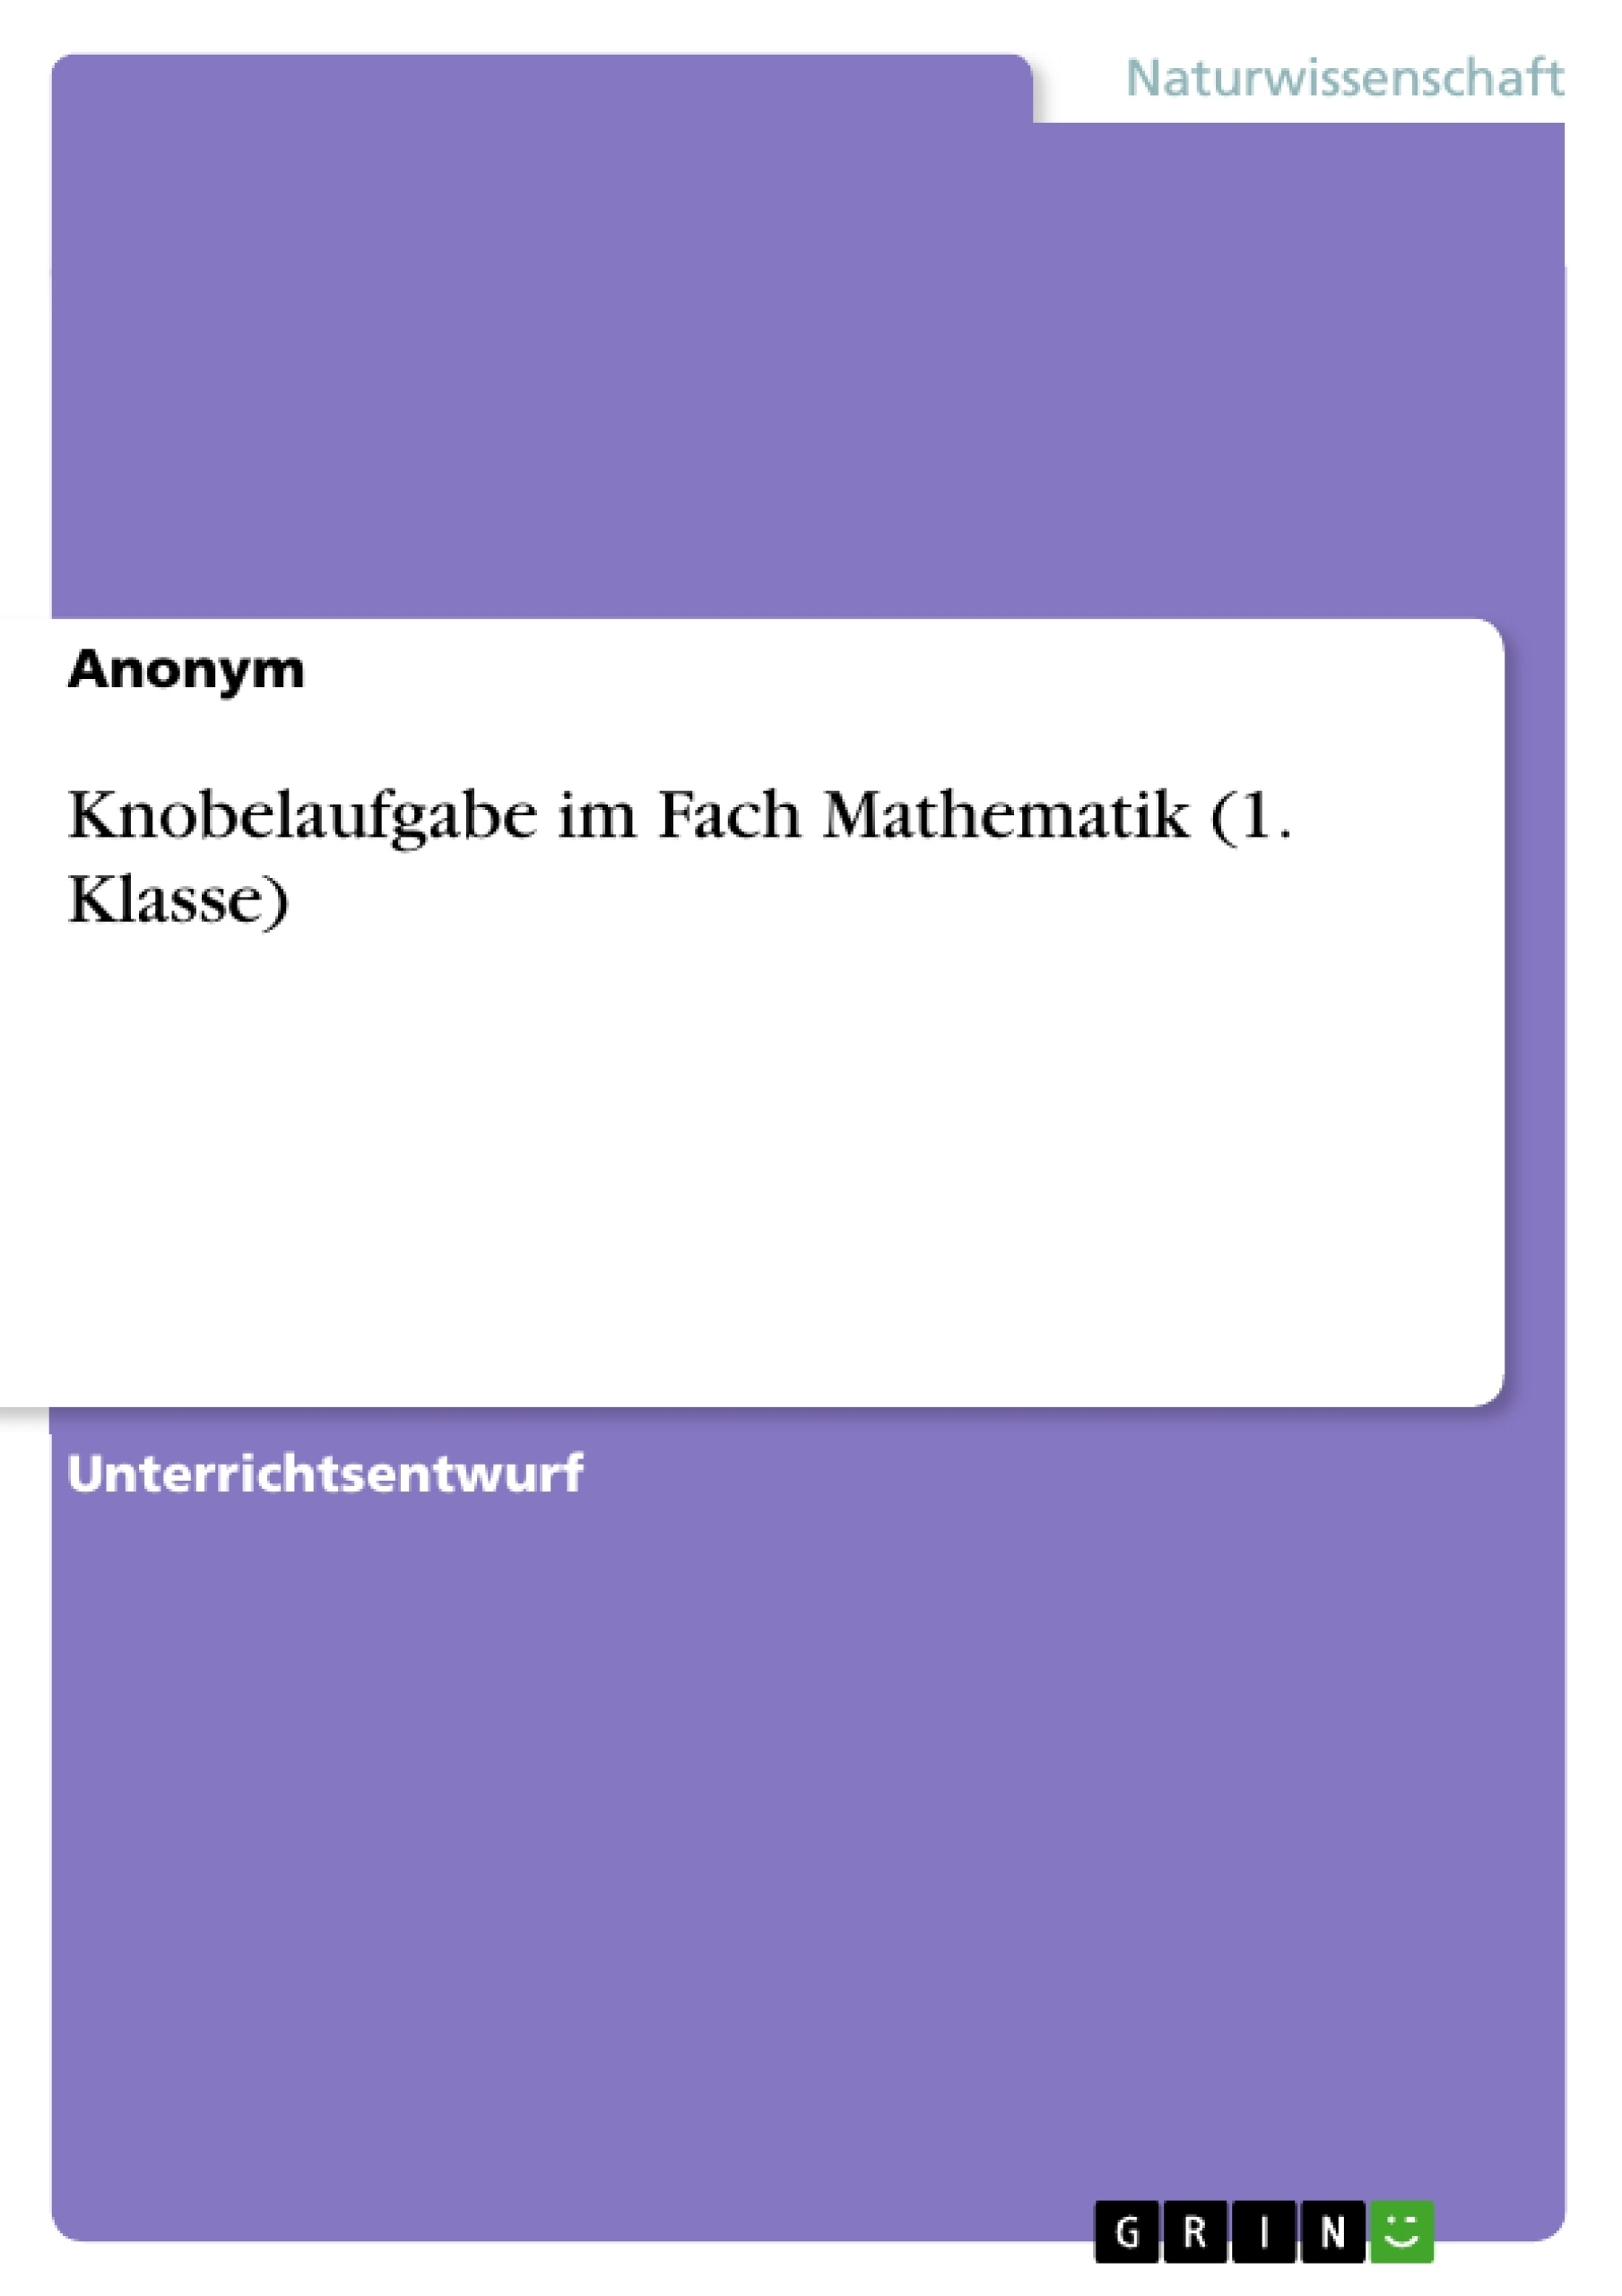 Titel: Knobelaufgabe im Fach Mathematik (1. Klasse)